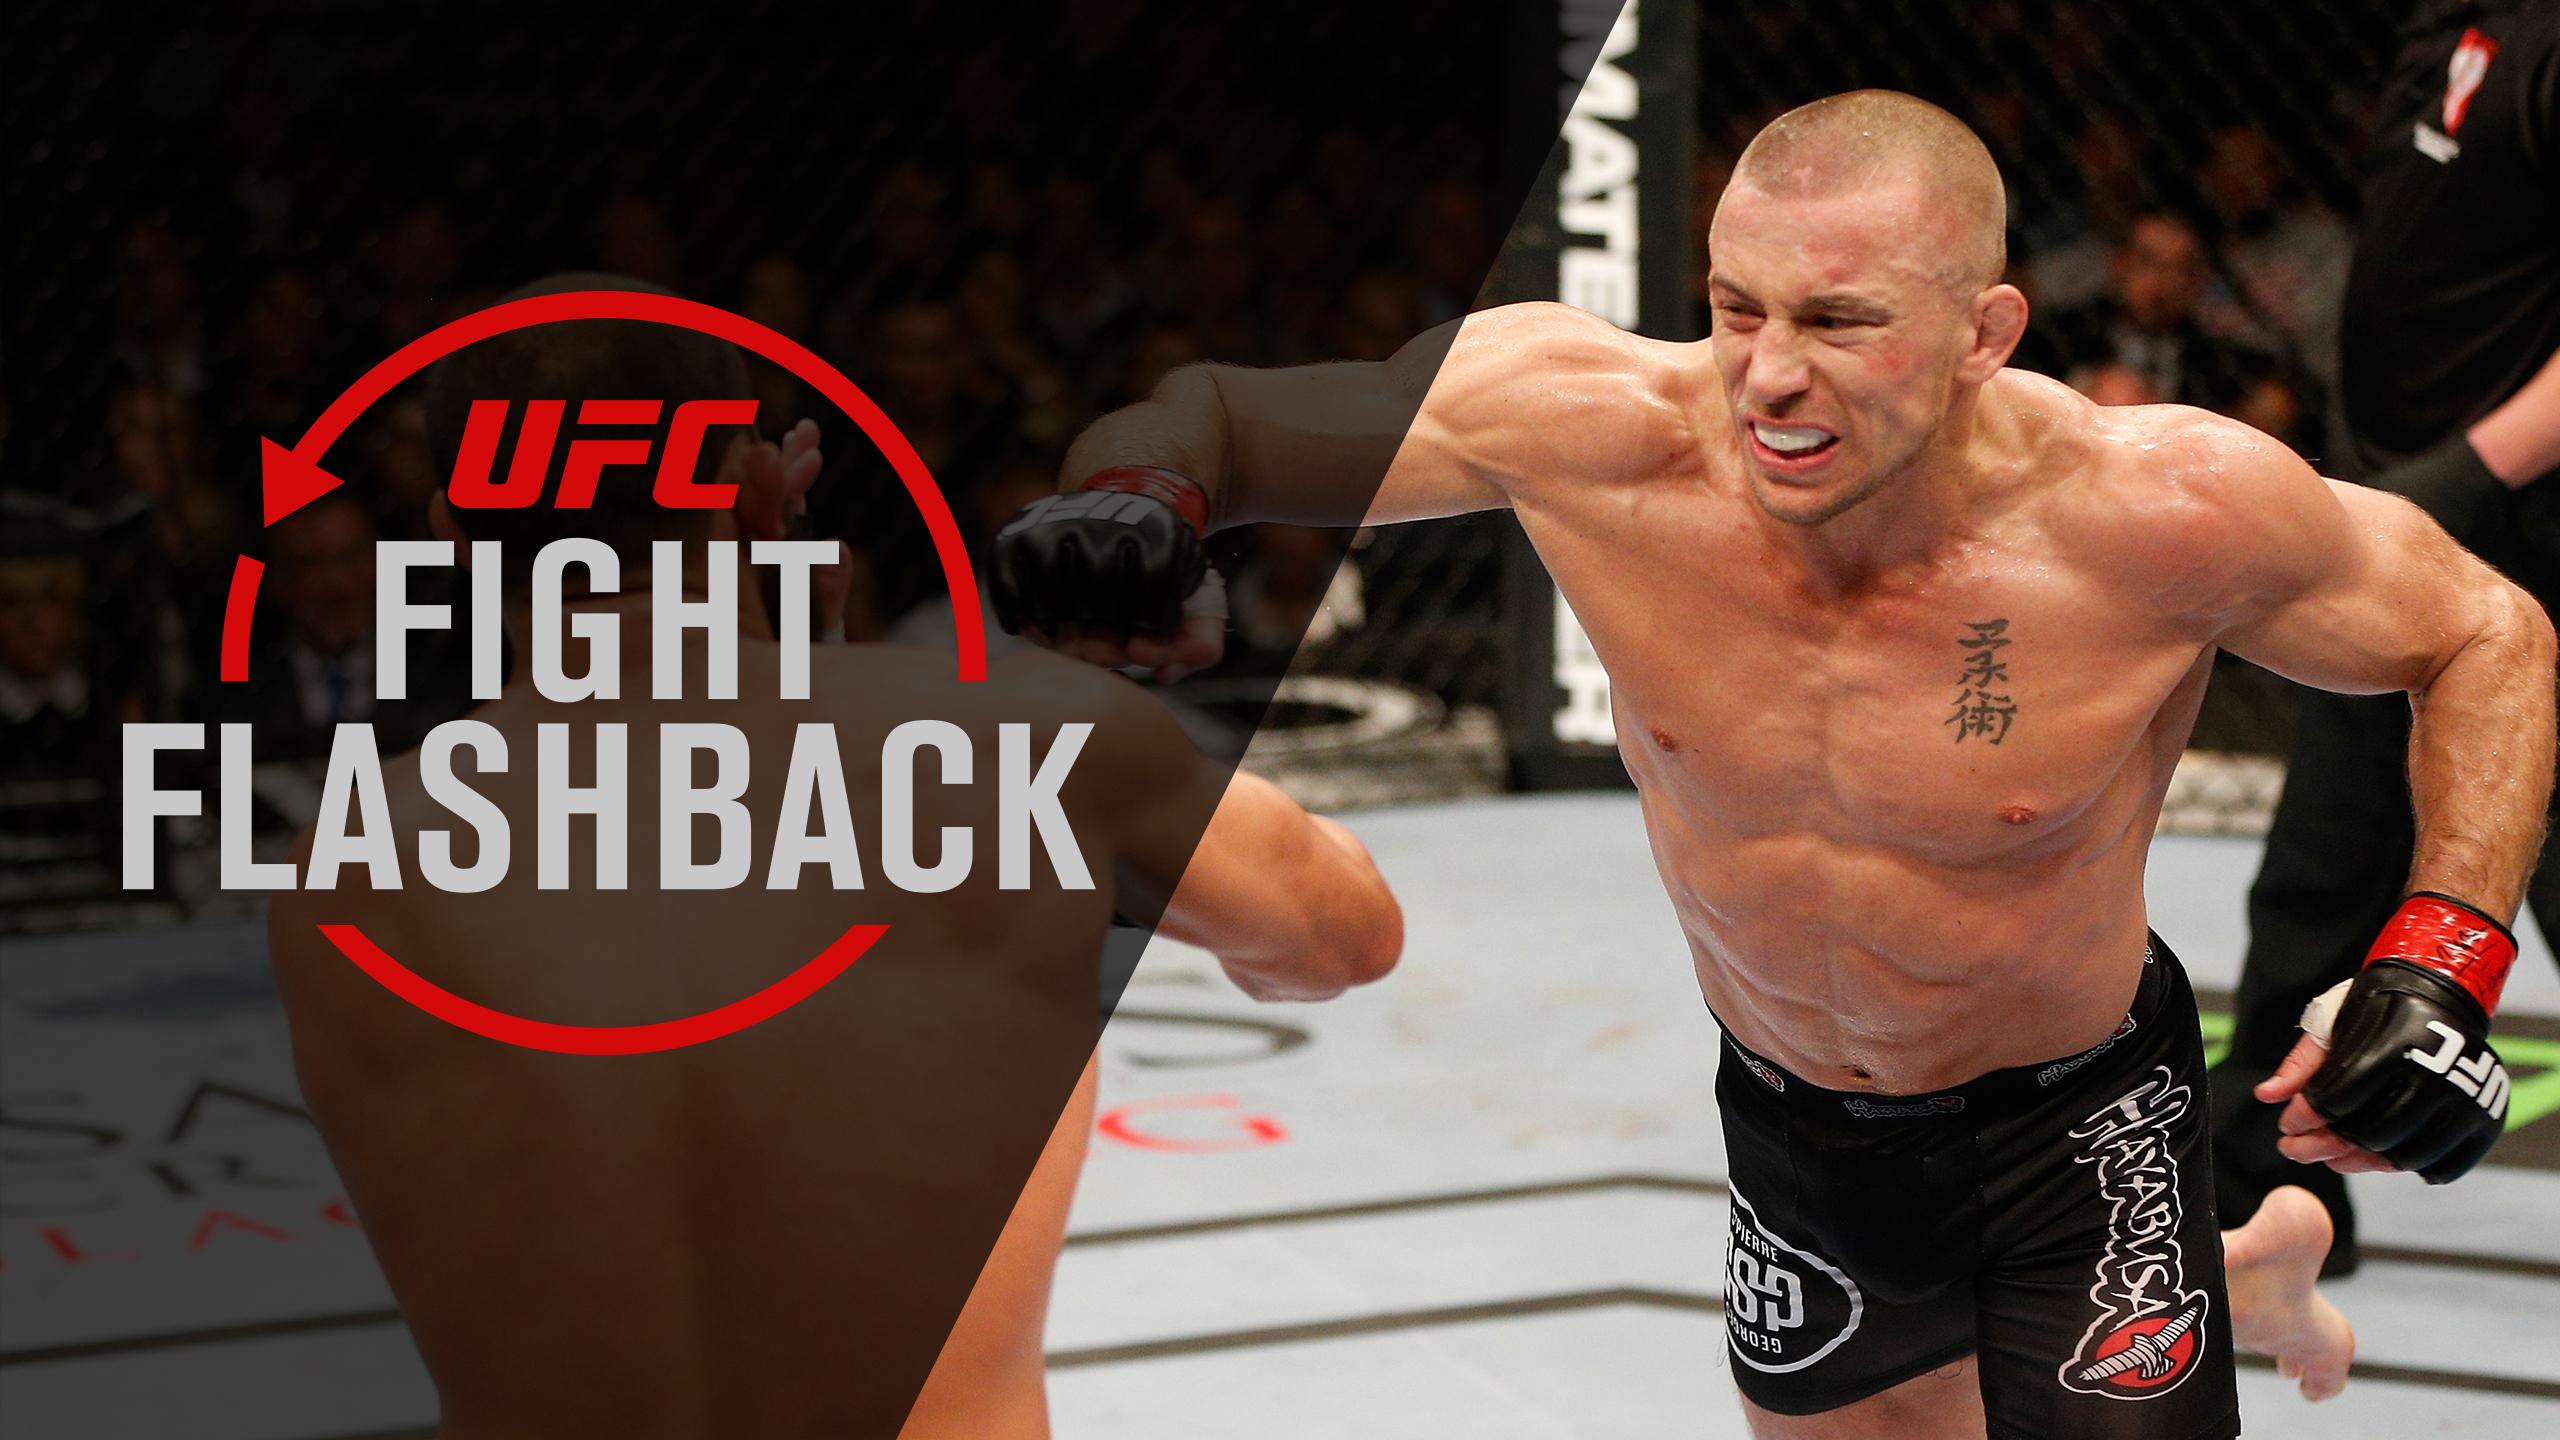 UFC Fight Flashback: GSP vs Hendricks